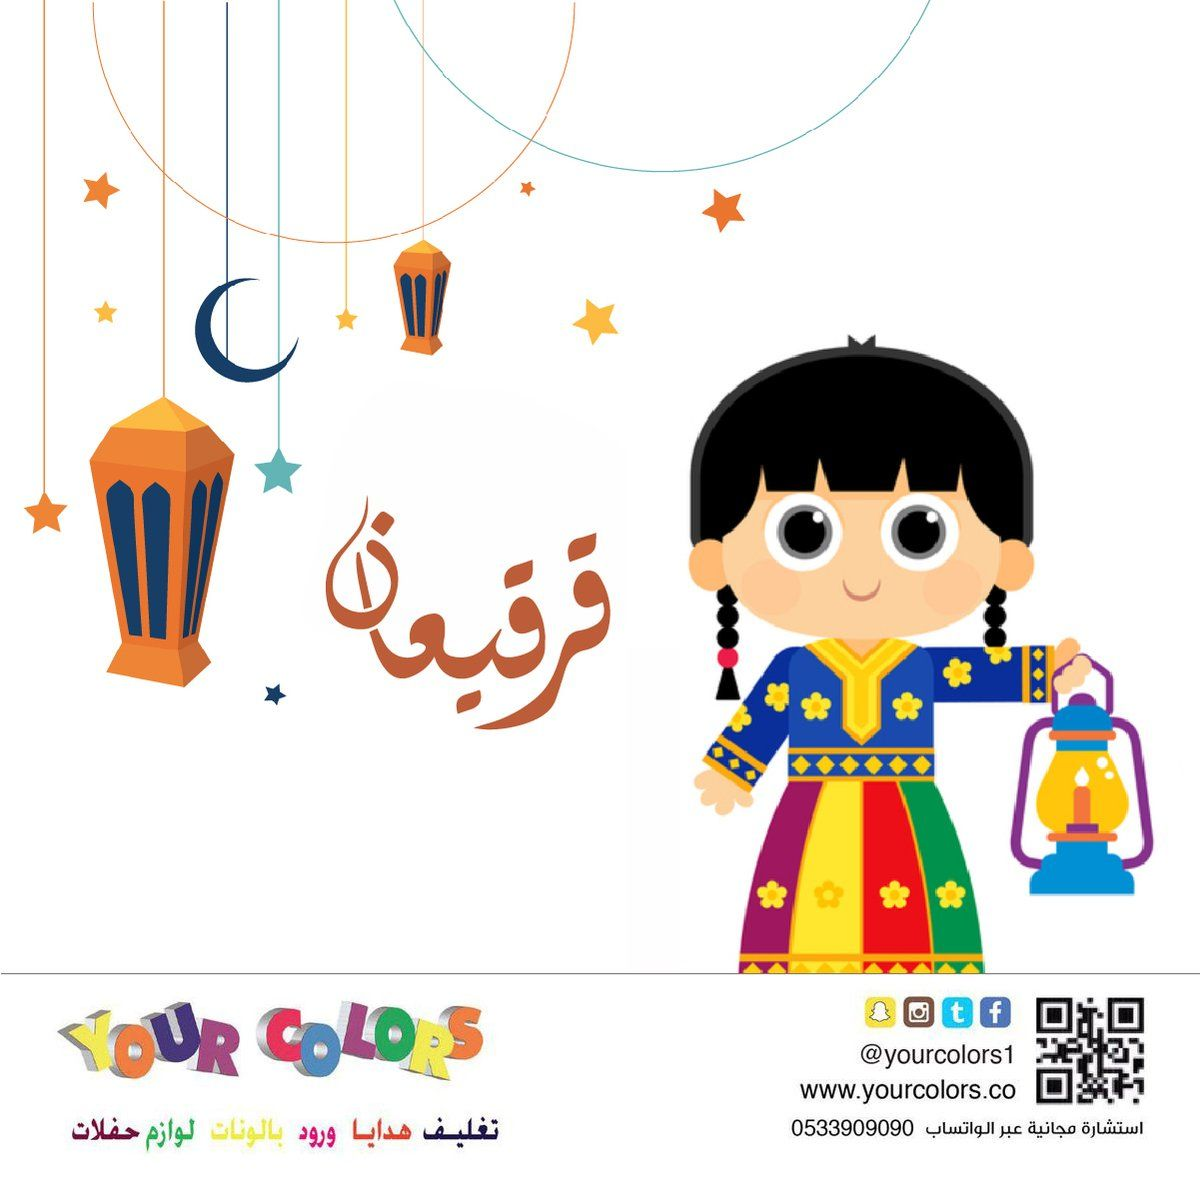 قرقيعان Pic Twitter Com بحث في تويتر Ramadan Images Birthday Balloons Pictures Ramadan Gifts